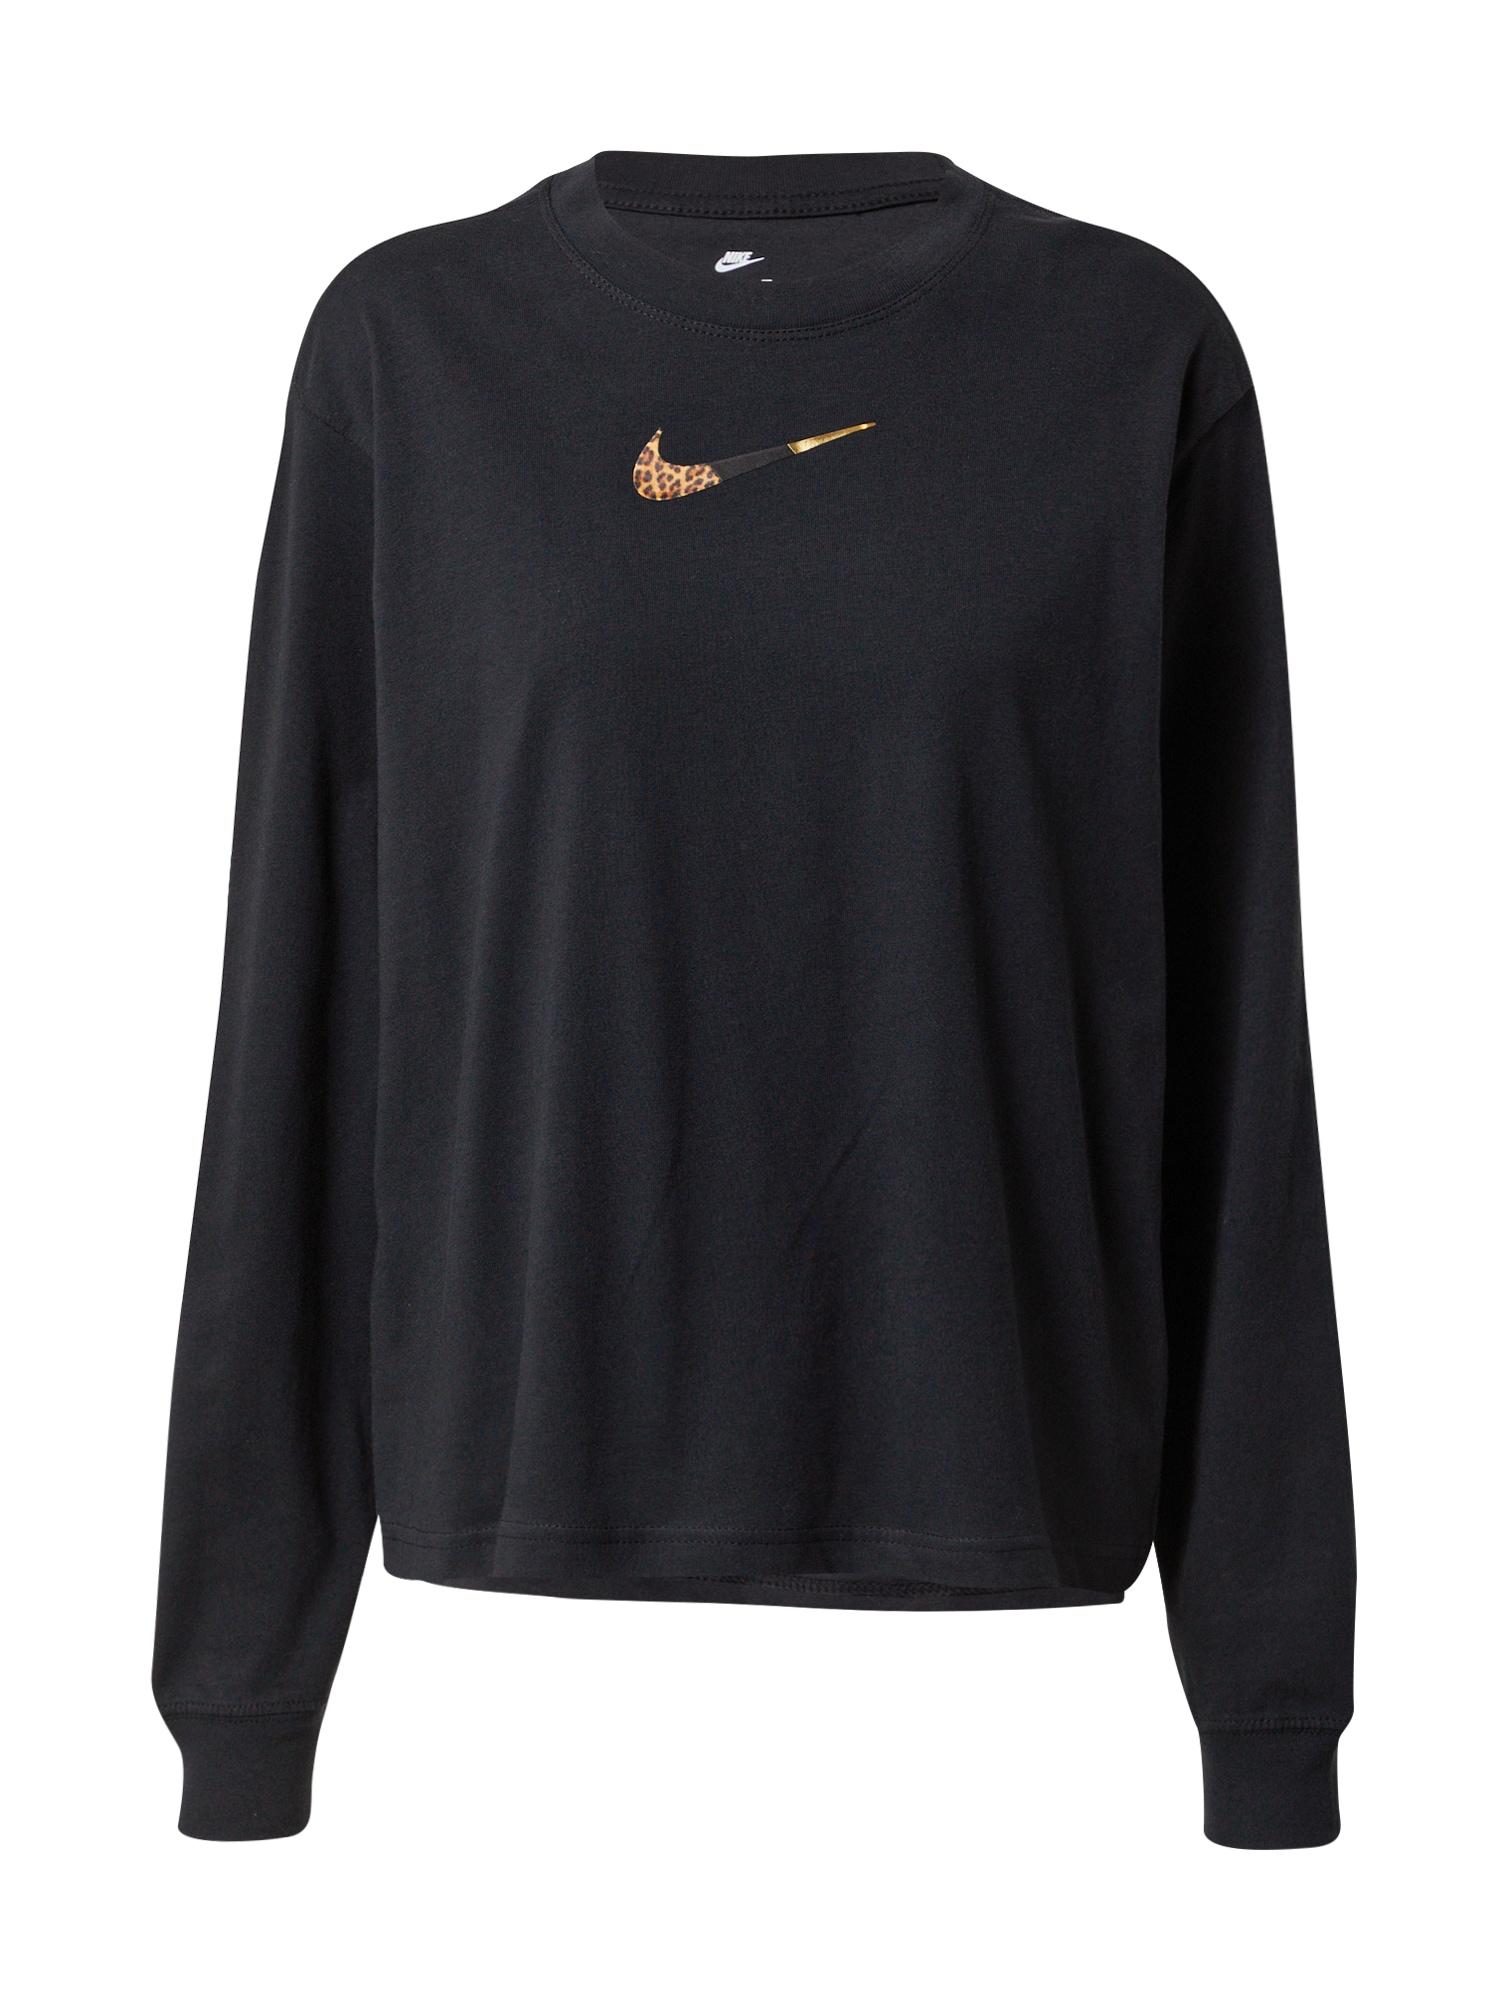 Nike Sportswear Tričko  čierna / zlatá / hnedá